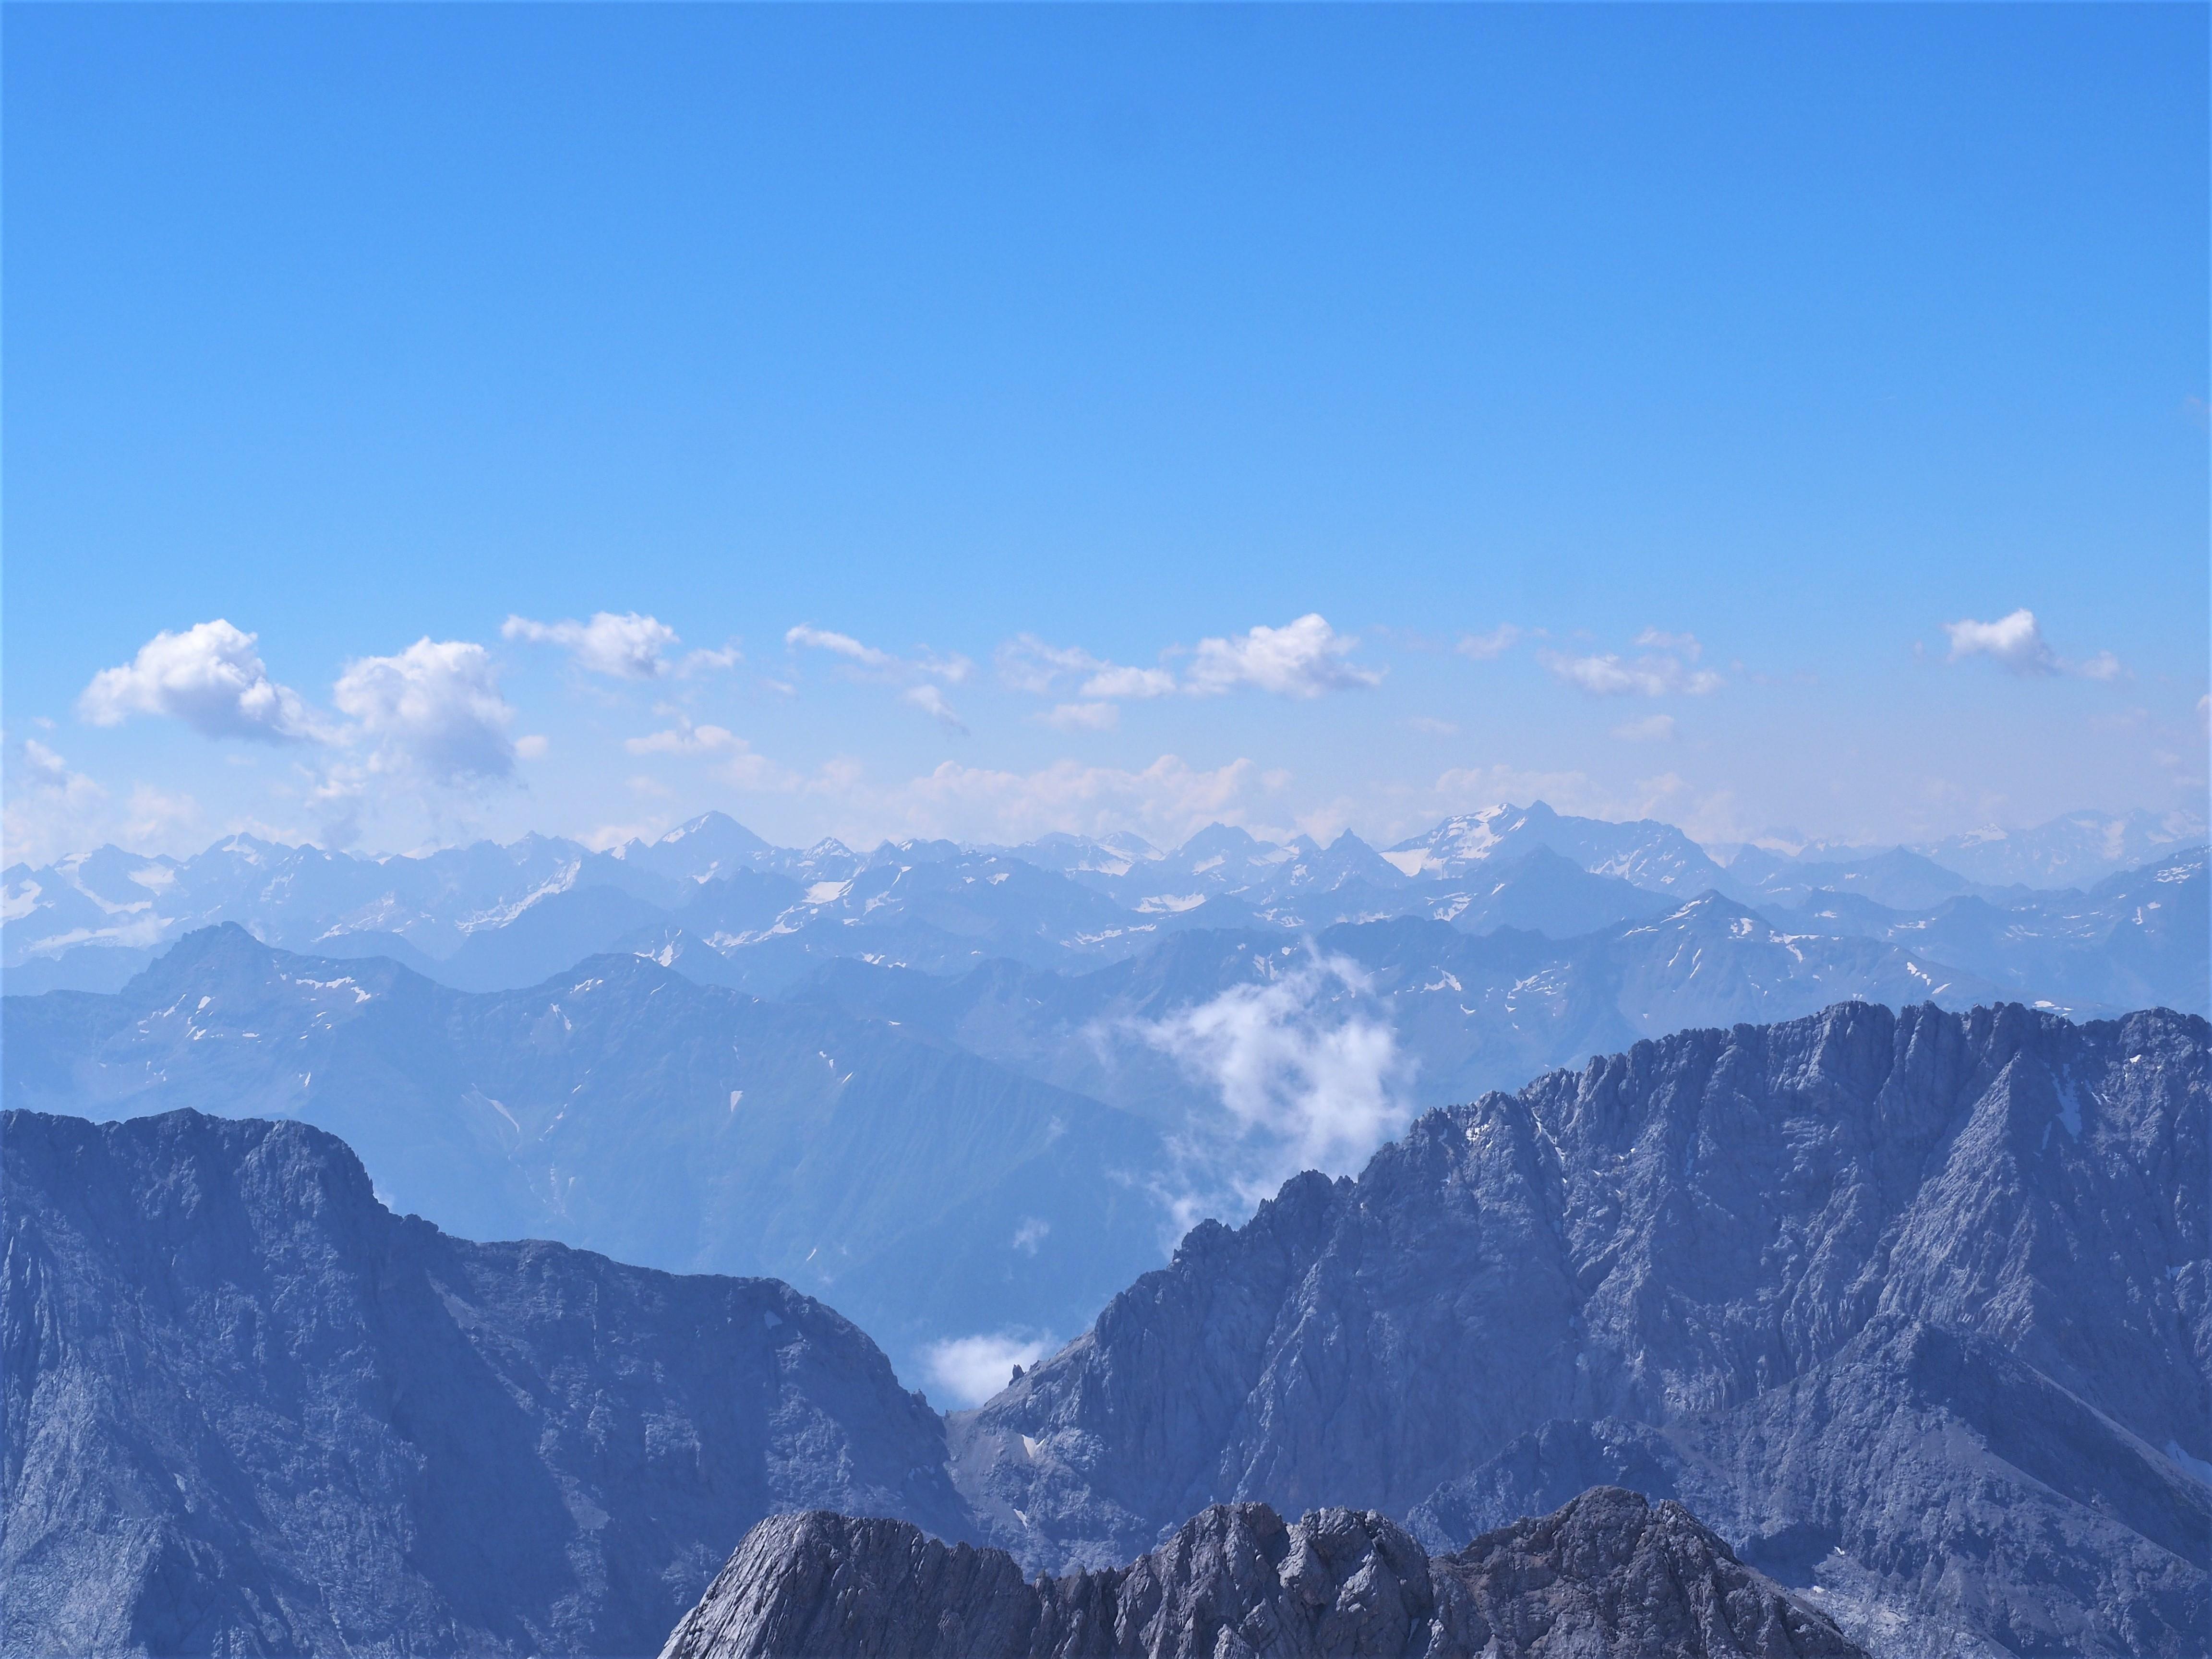 4.-Zugspitze-BLOG-VOYAGE-clioandco-allemagne-autriche-montagnes.